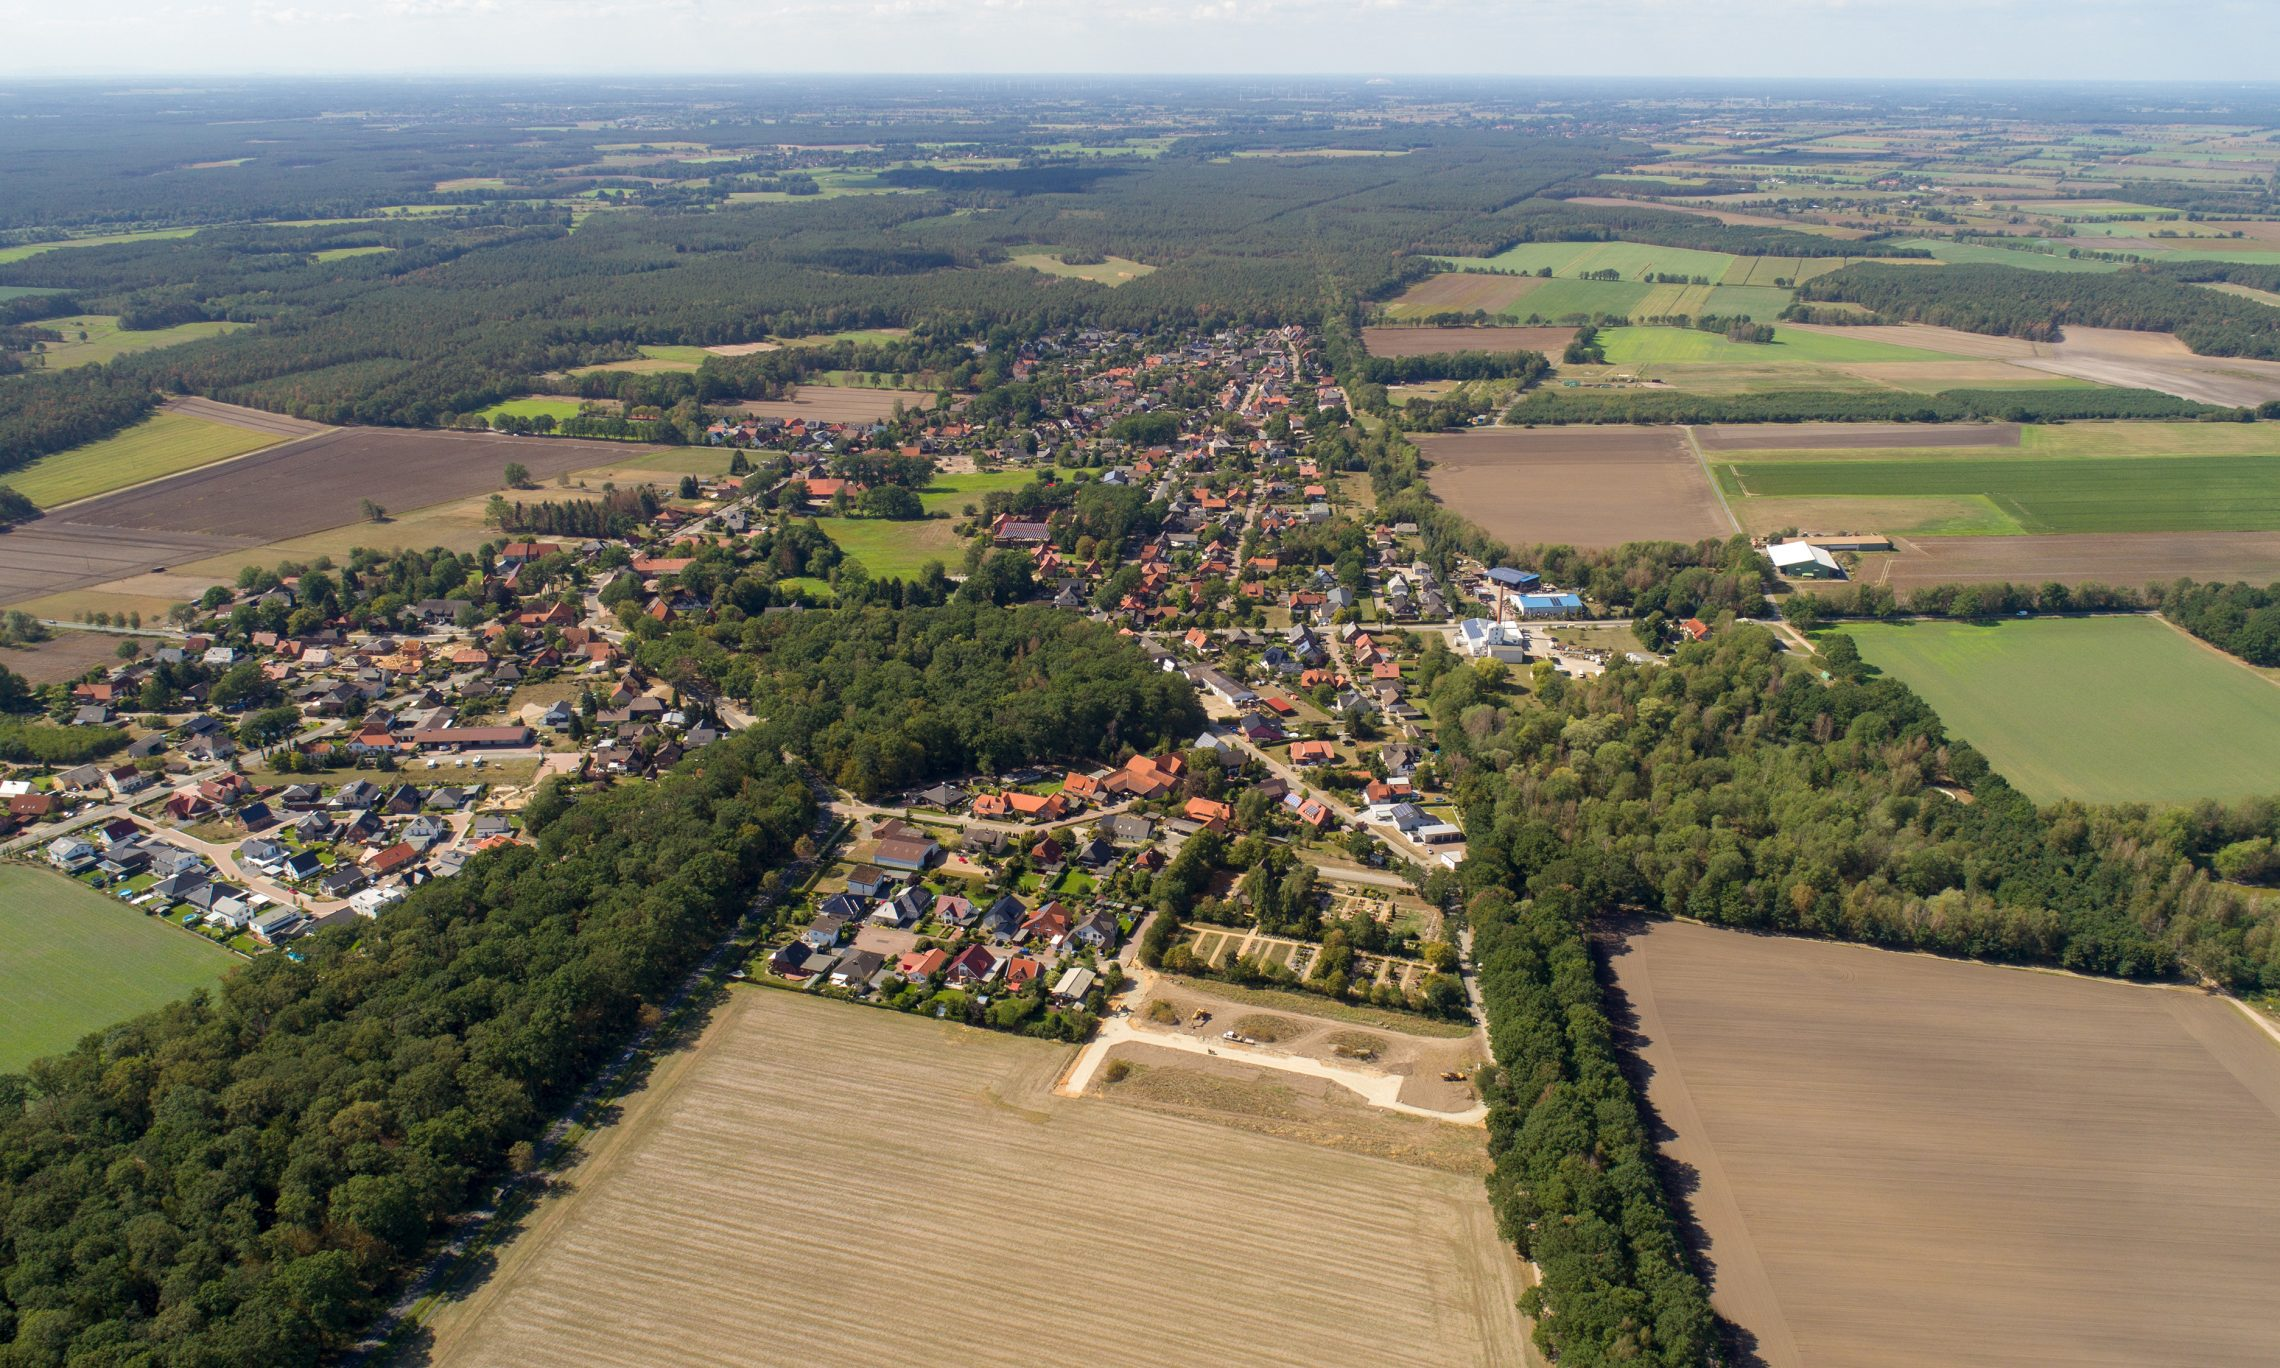 Wilsche, Berghop-Ost (Foto: Bauland Report)